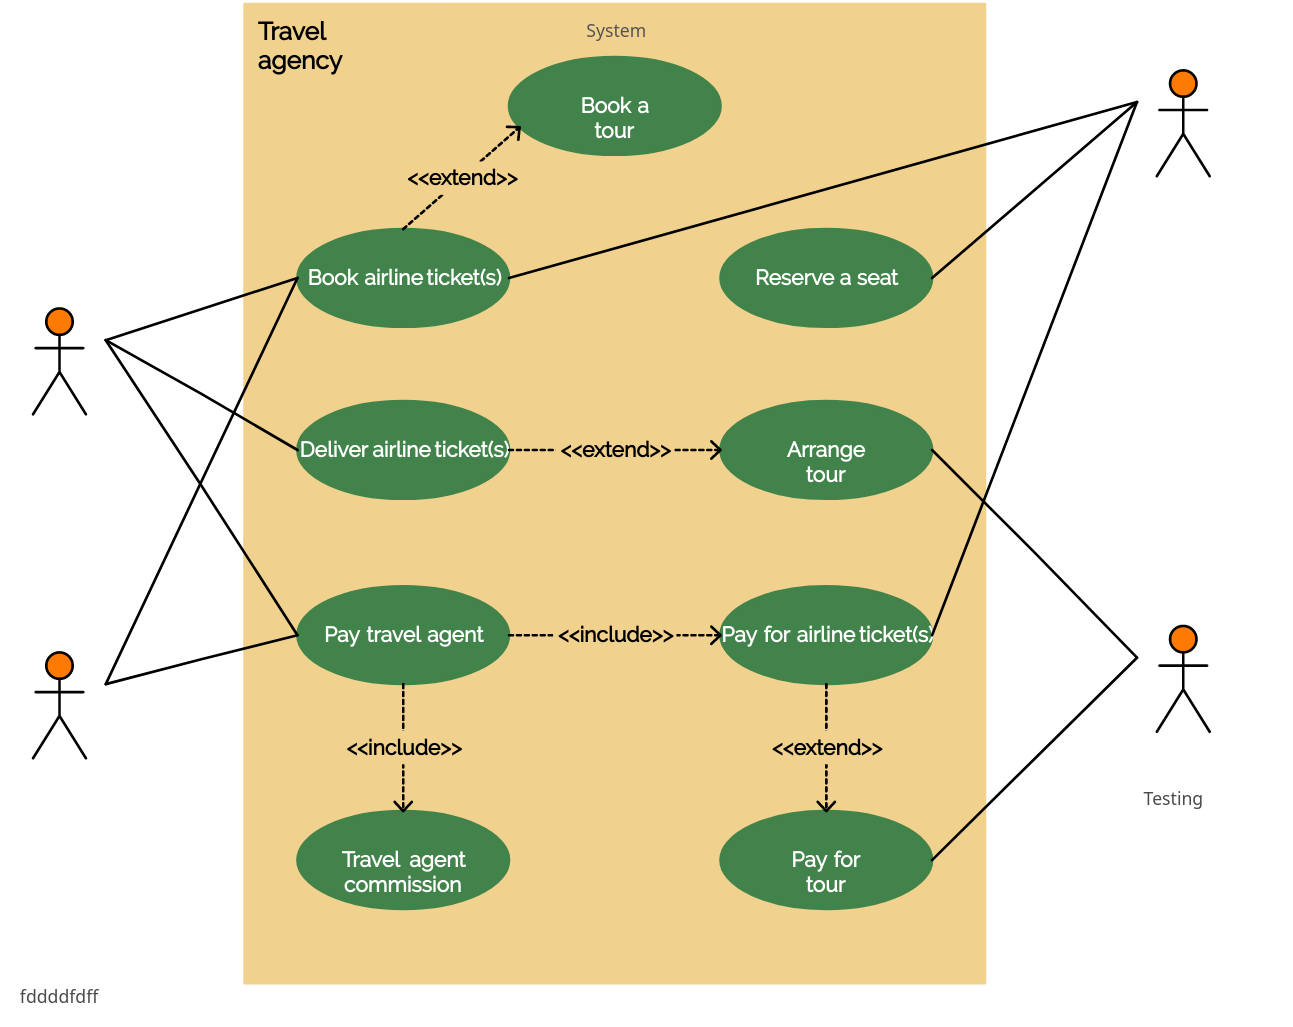 Use Case Diagram for Travel Agency | Viranga